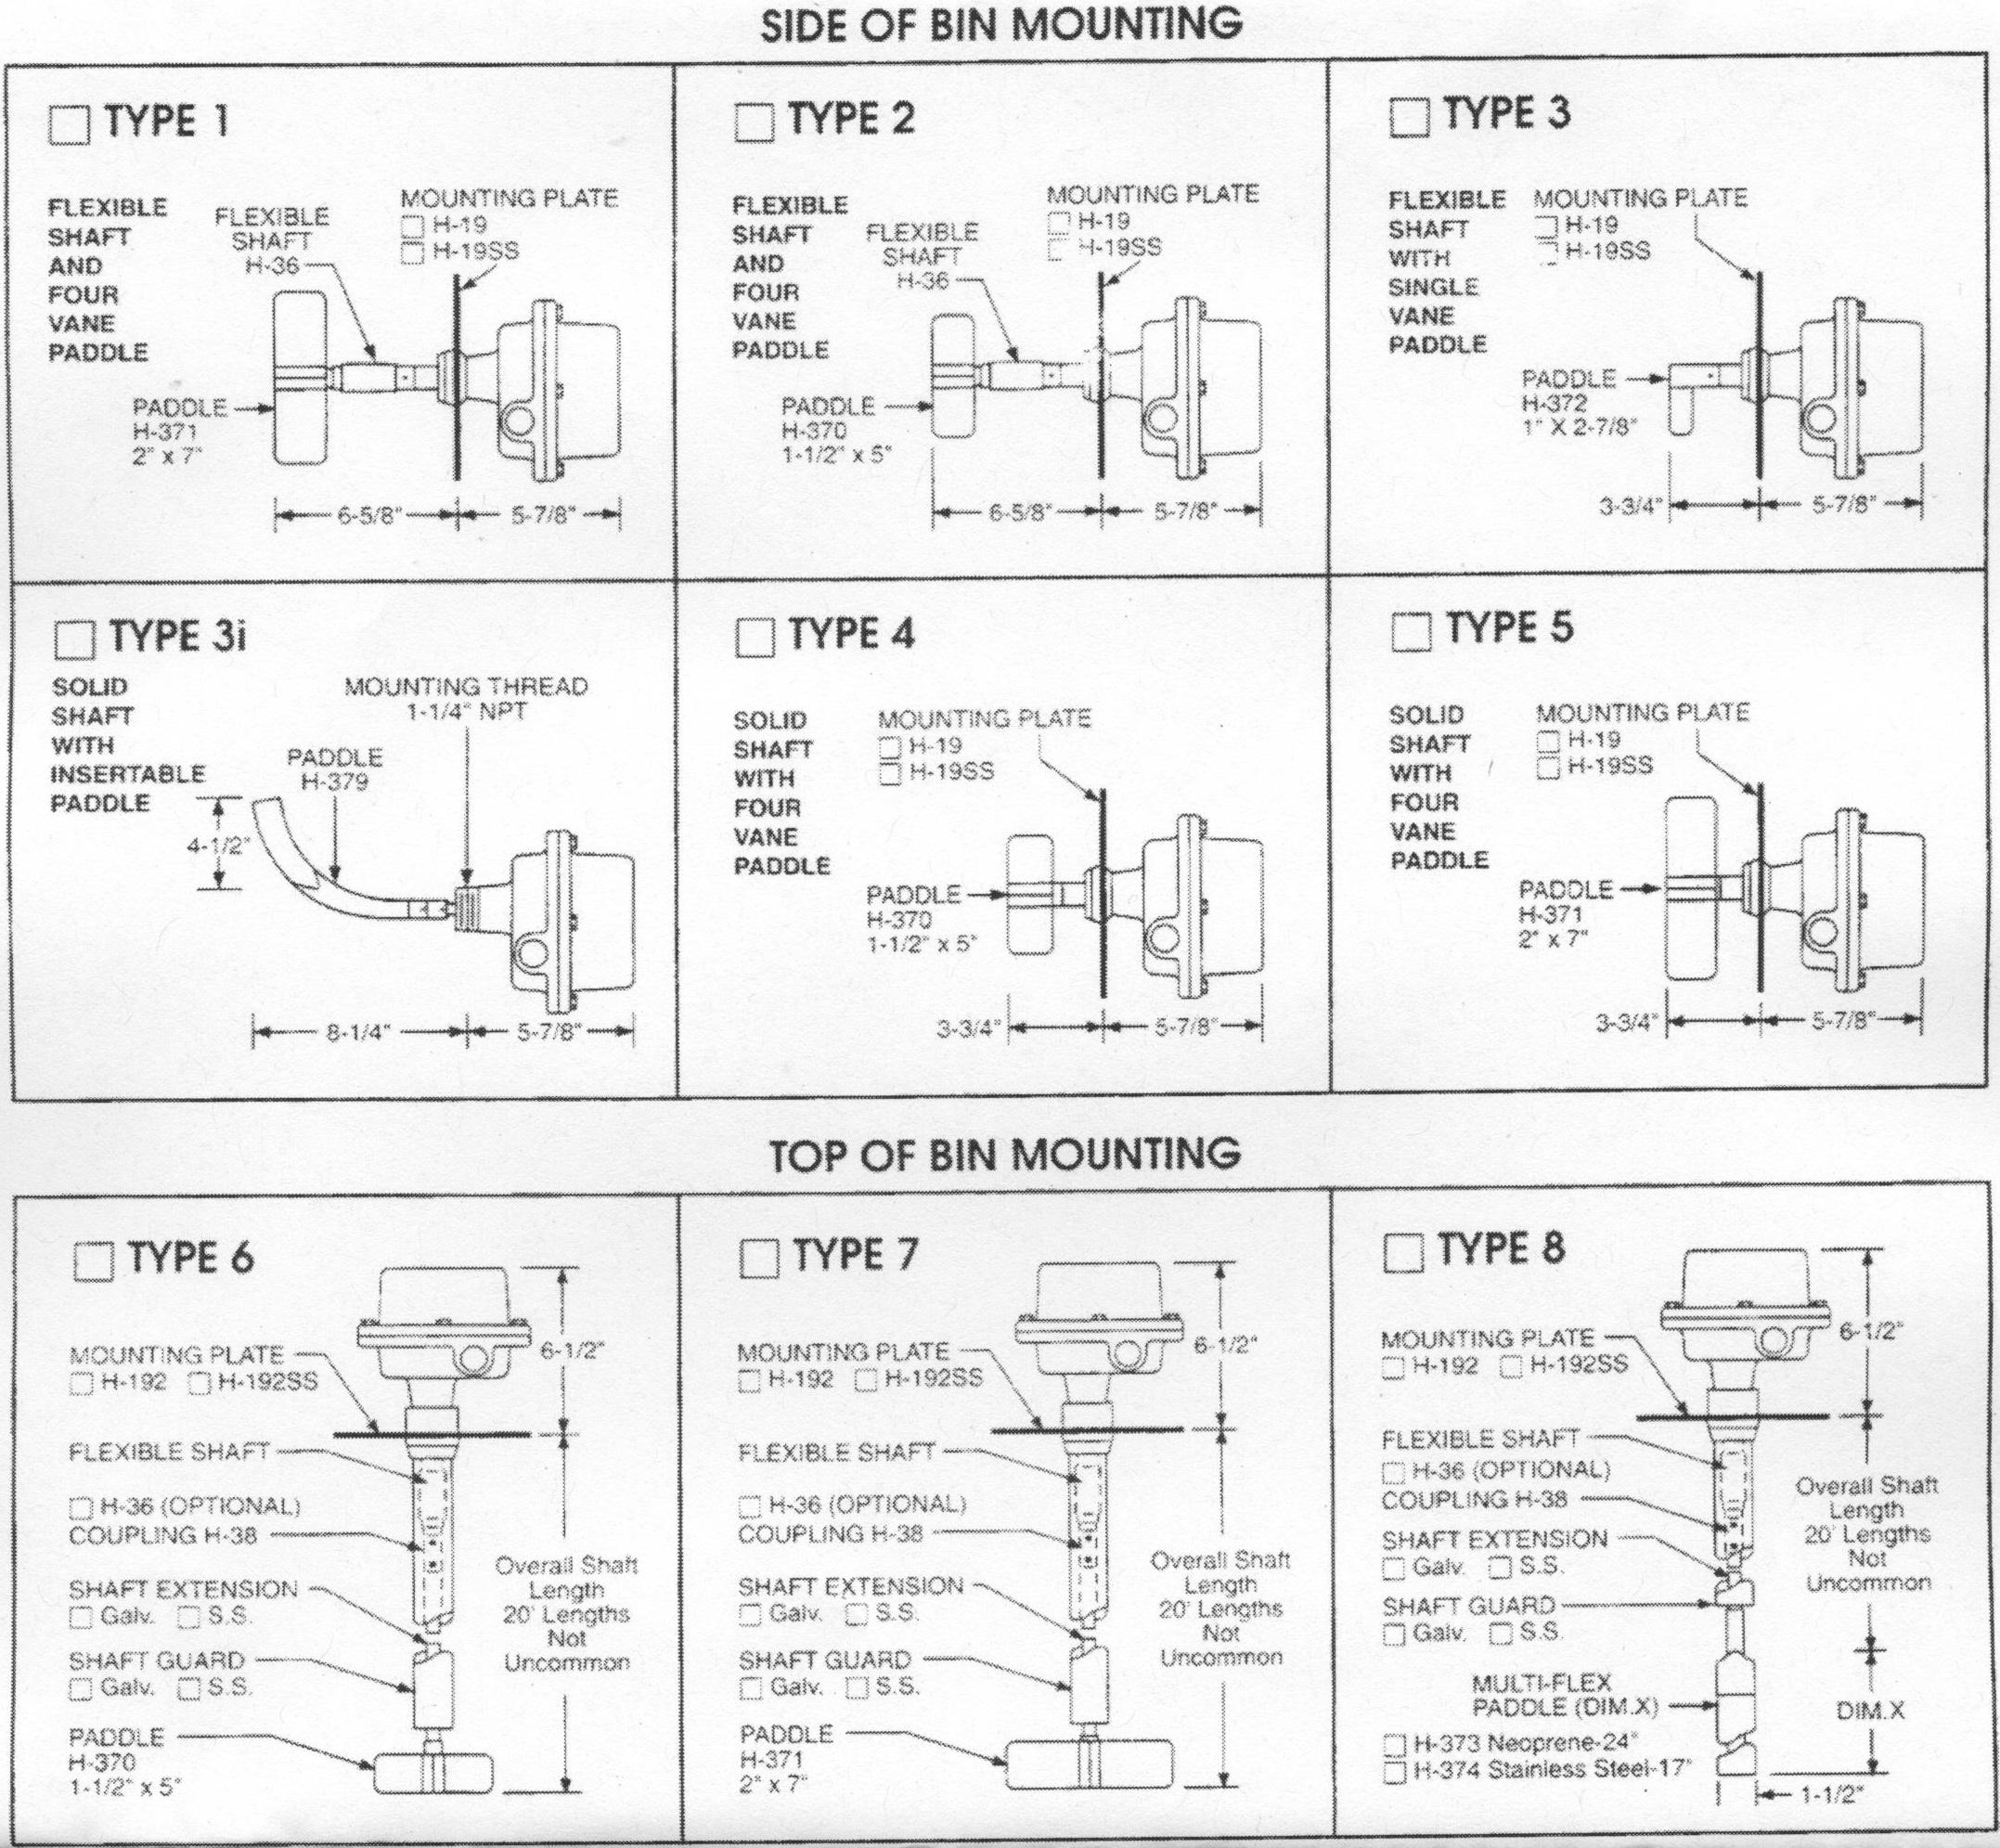 Super Safe Amp Super Safe Plus Roto Bindicator